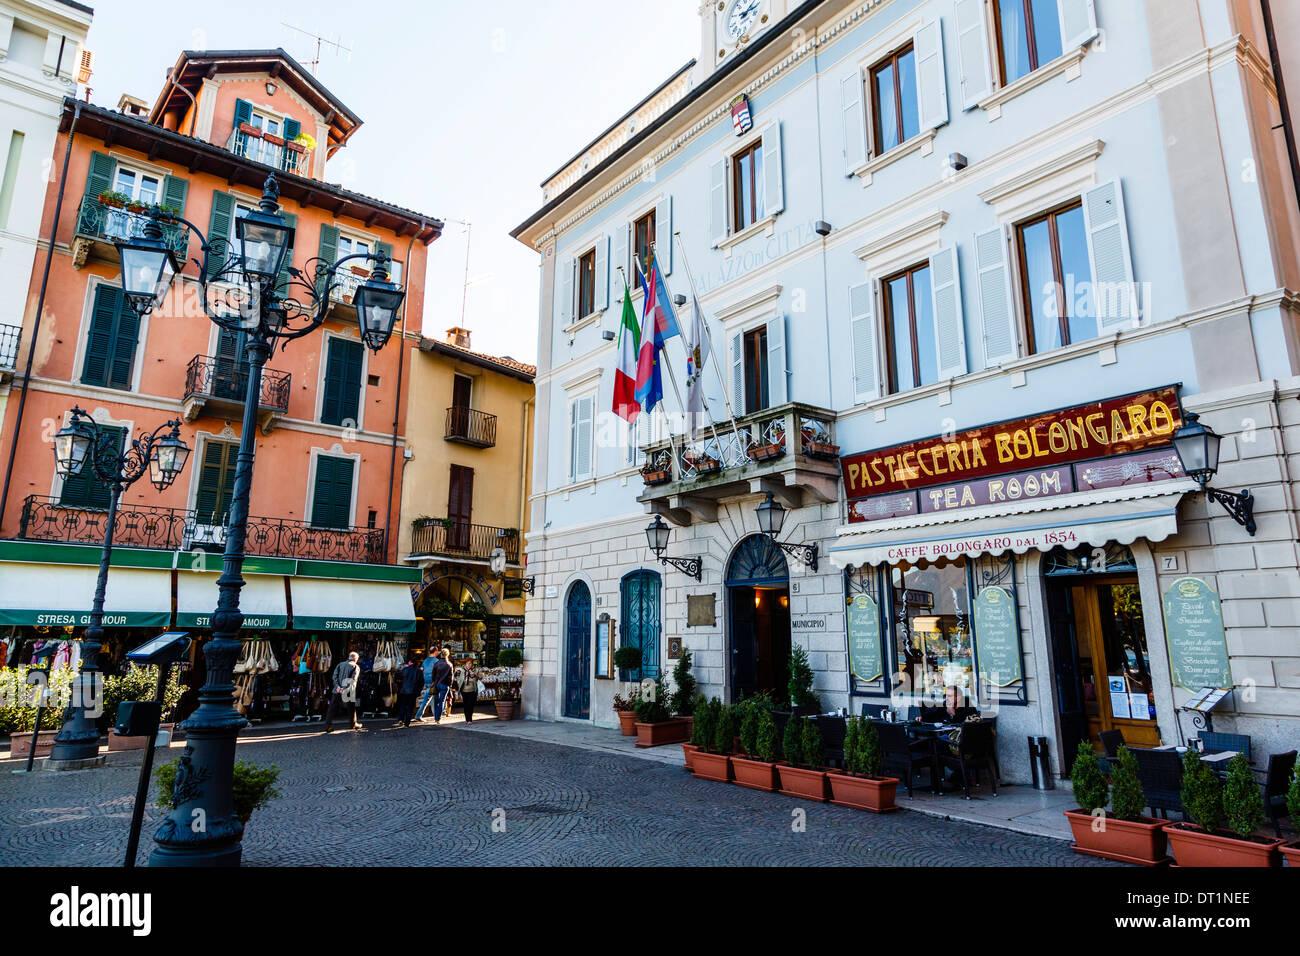 Stresa, Lake Maggiore, Piedmont, Italy, Europe - Stock Image